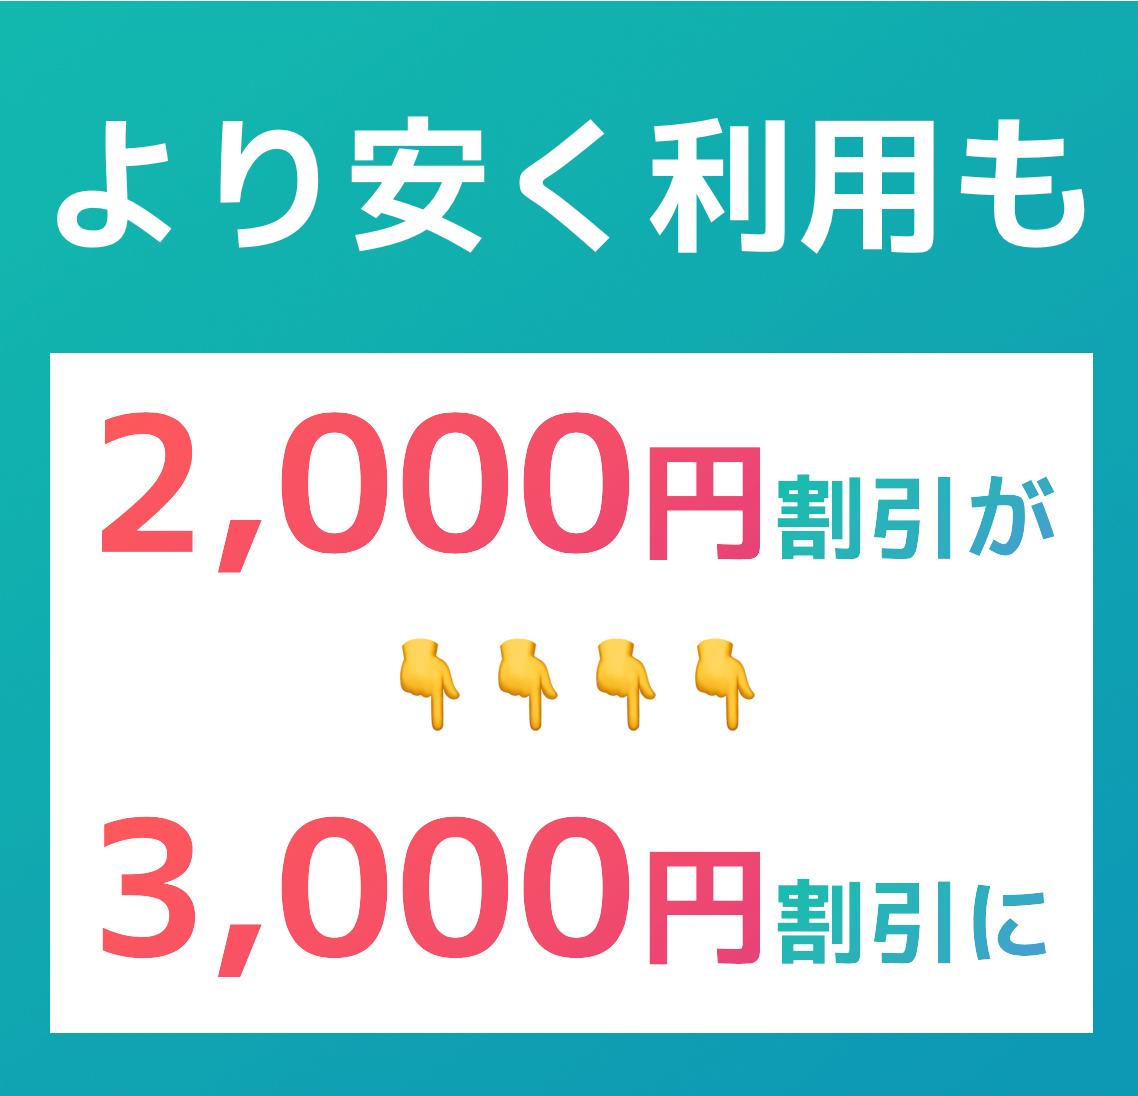 news-discount-13